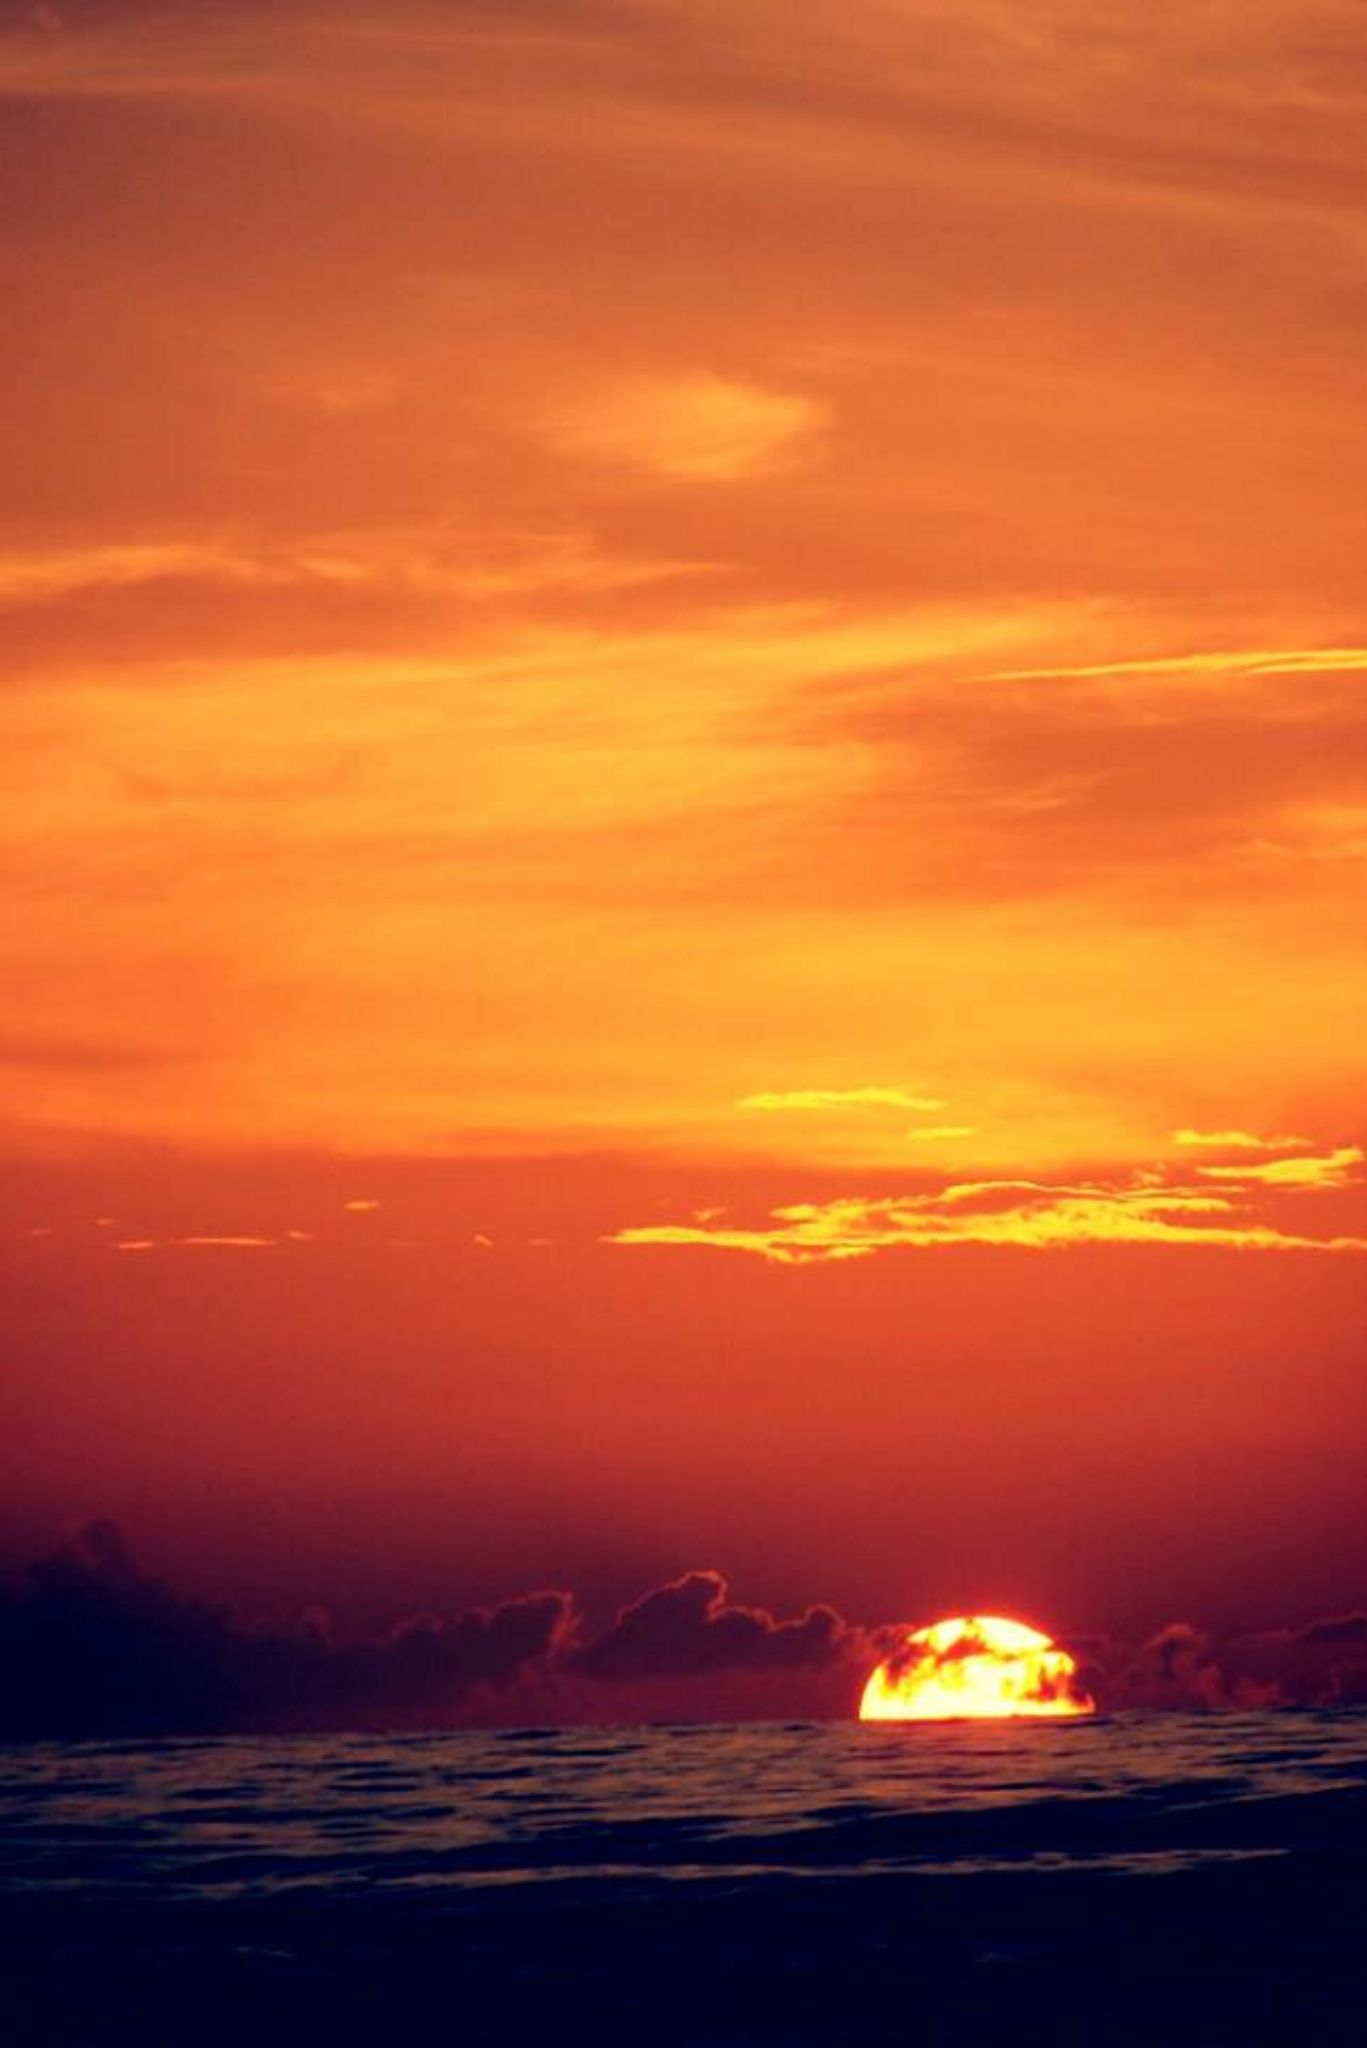 sunrise over the ocean by Chelsey Elizabeth